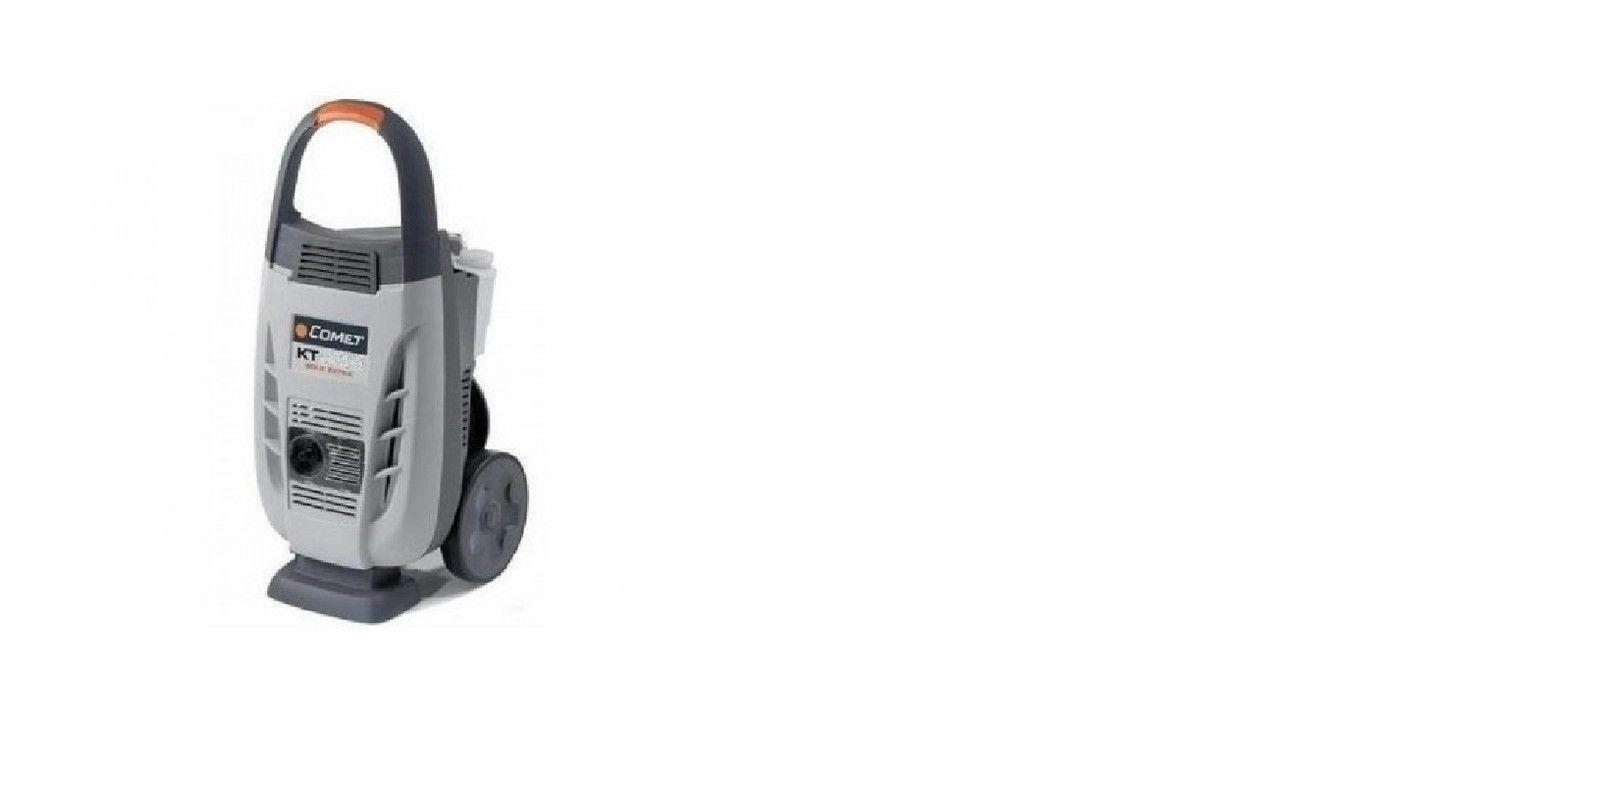 risparmia fino al 70% COMET KT 1750 CLASSIC IDROPULITICE ACQUA FREDDA COMET COMET COMET KT 1750 CLASSIC  edizione limitata a caldo